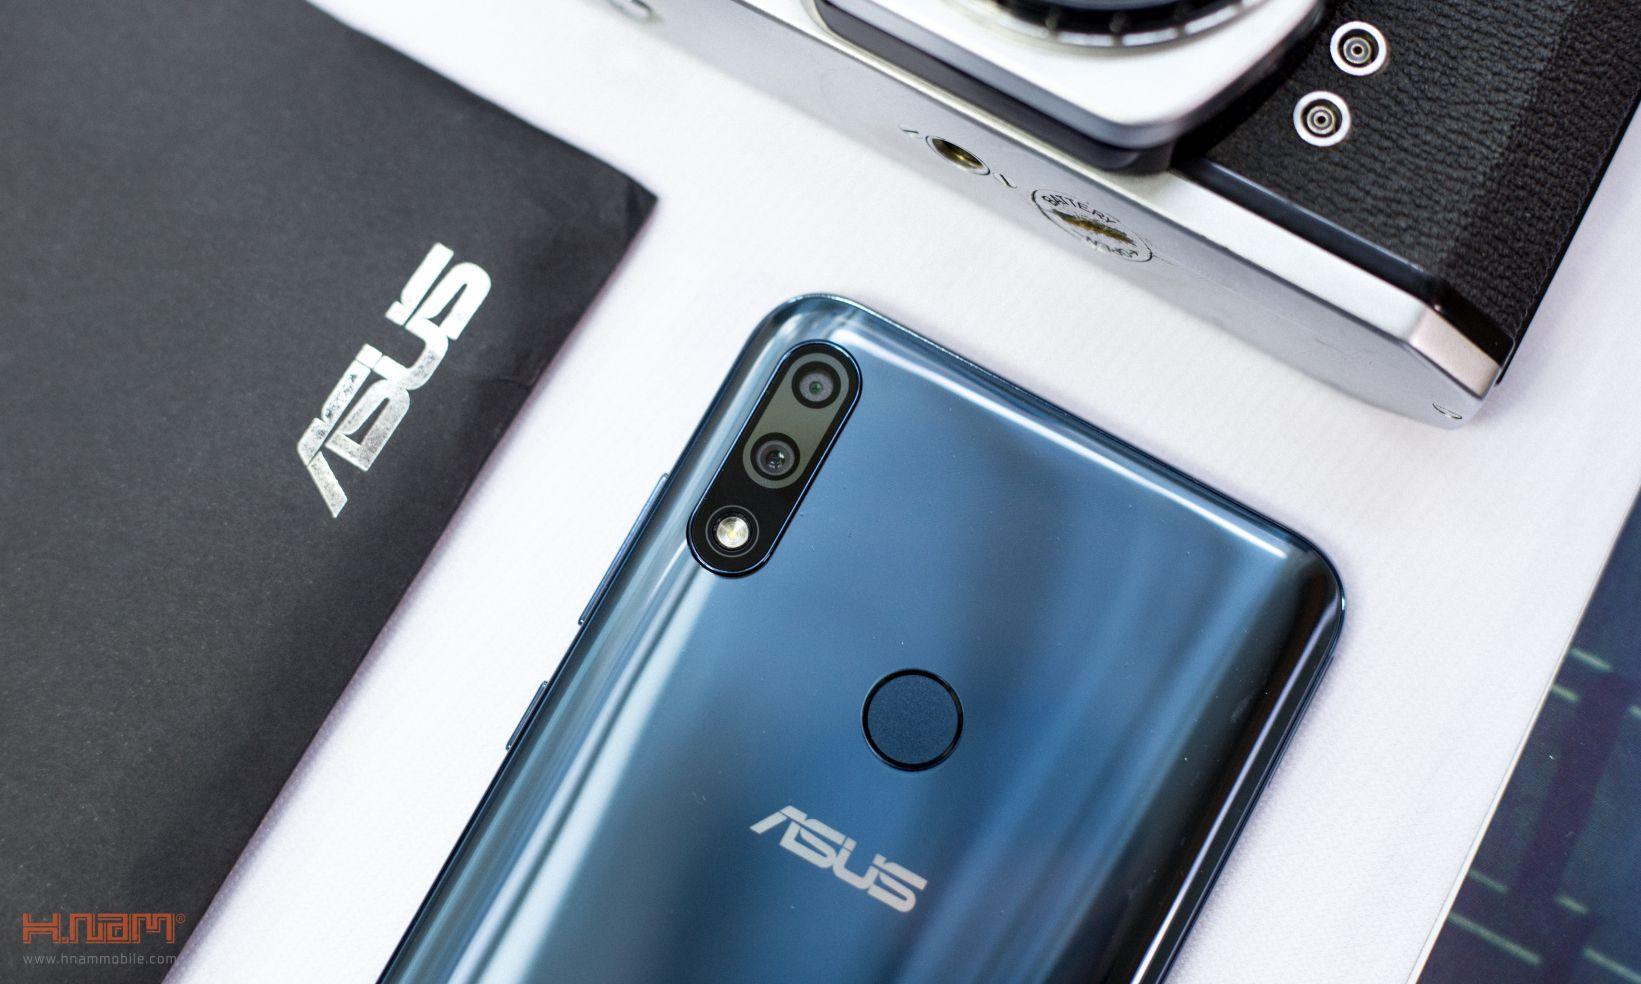 Trên tay Zenfone Max Pro M2: Snapdragon 660, pin 5000mAh, 5.29 triệu hình 13